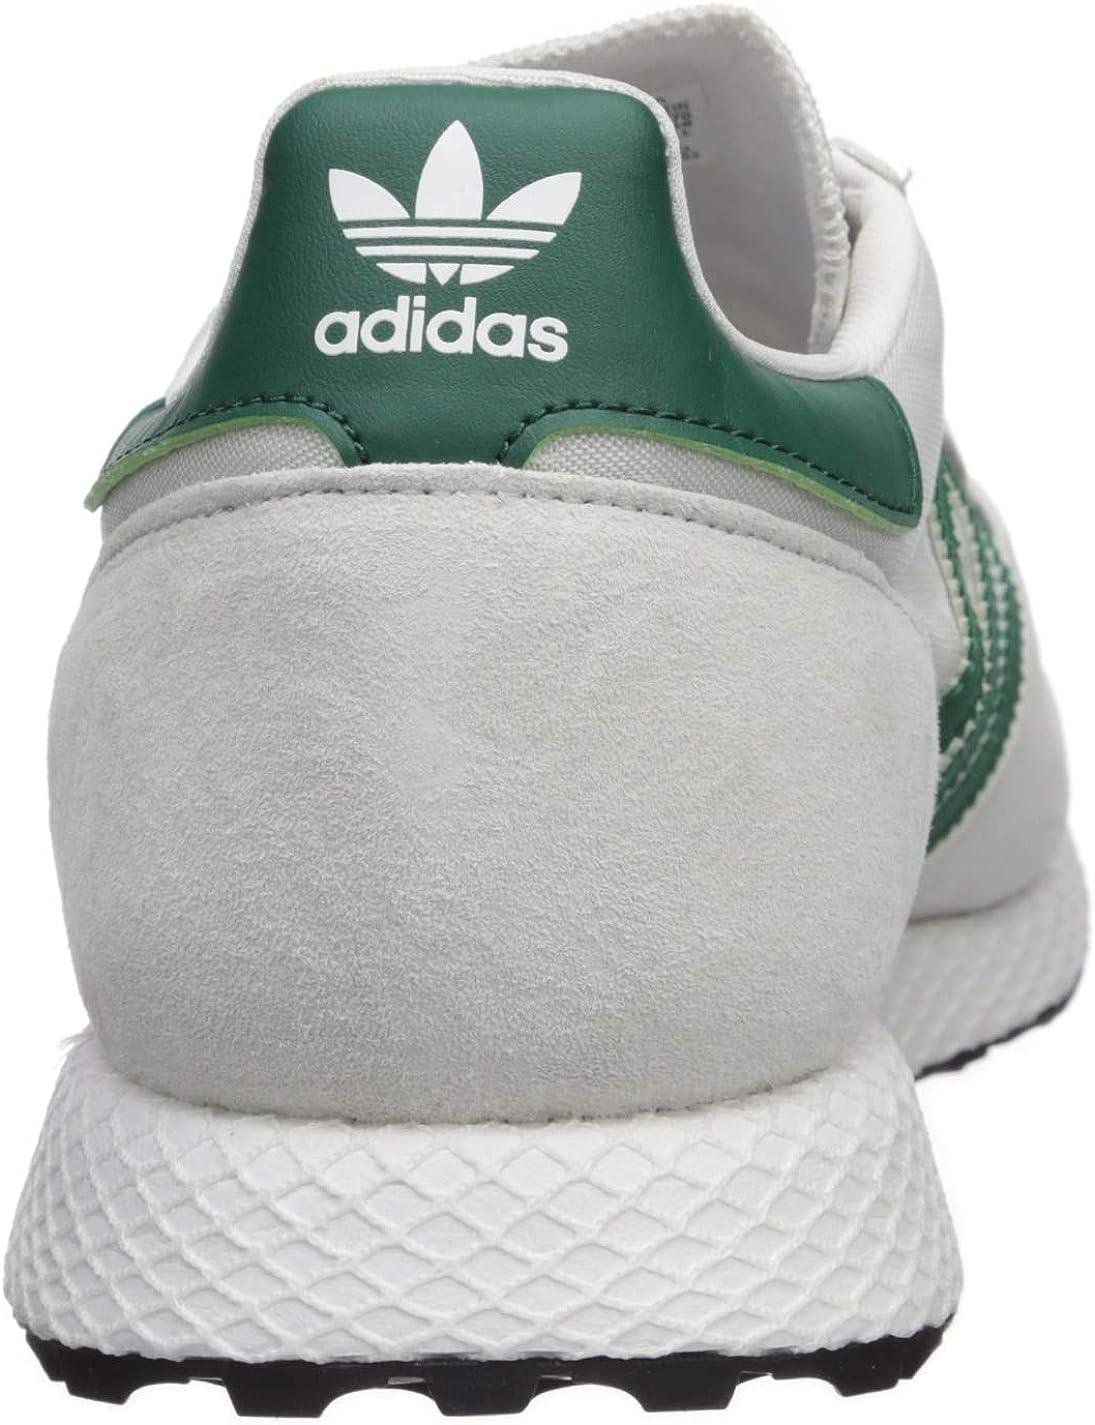 adidas Forest Grove White Collegiate Green B41546 1